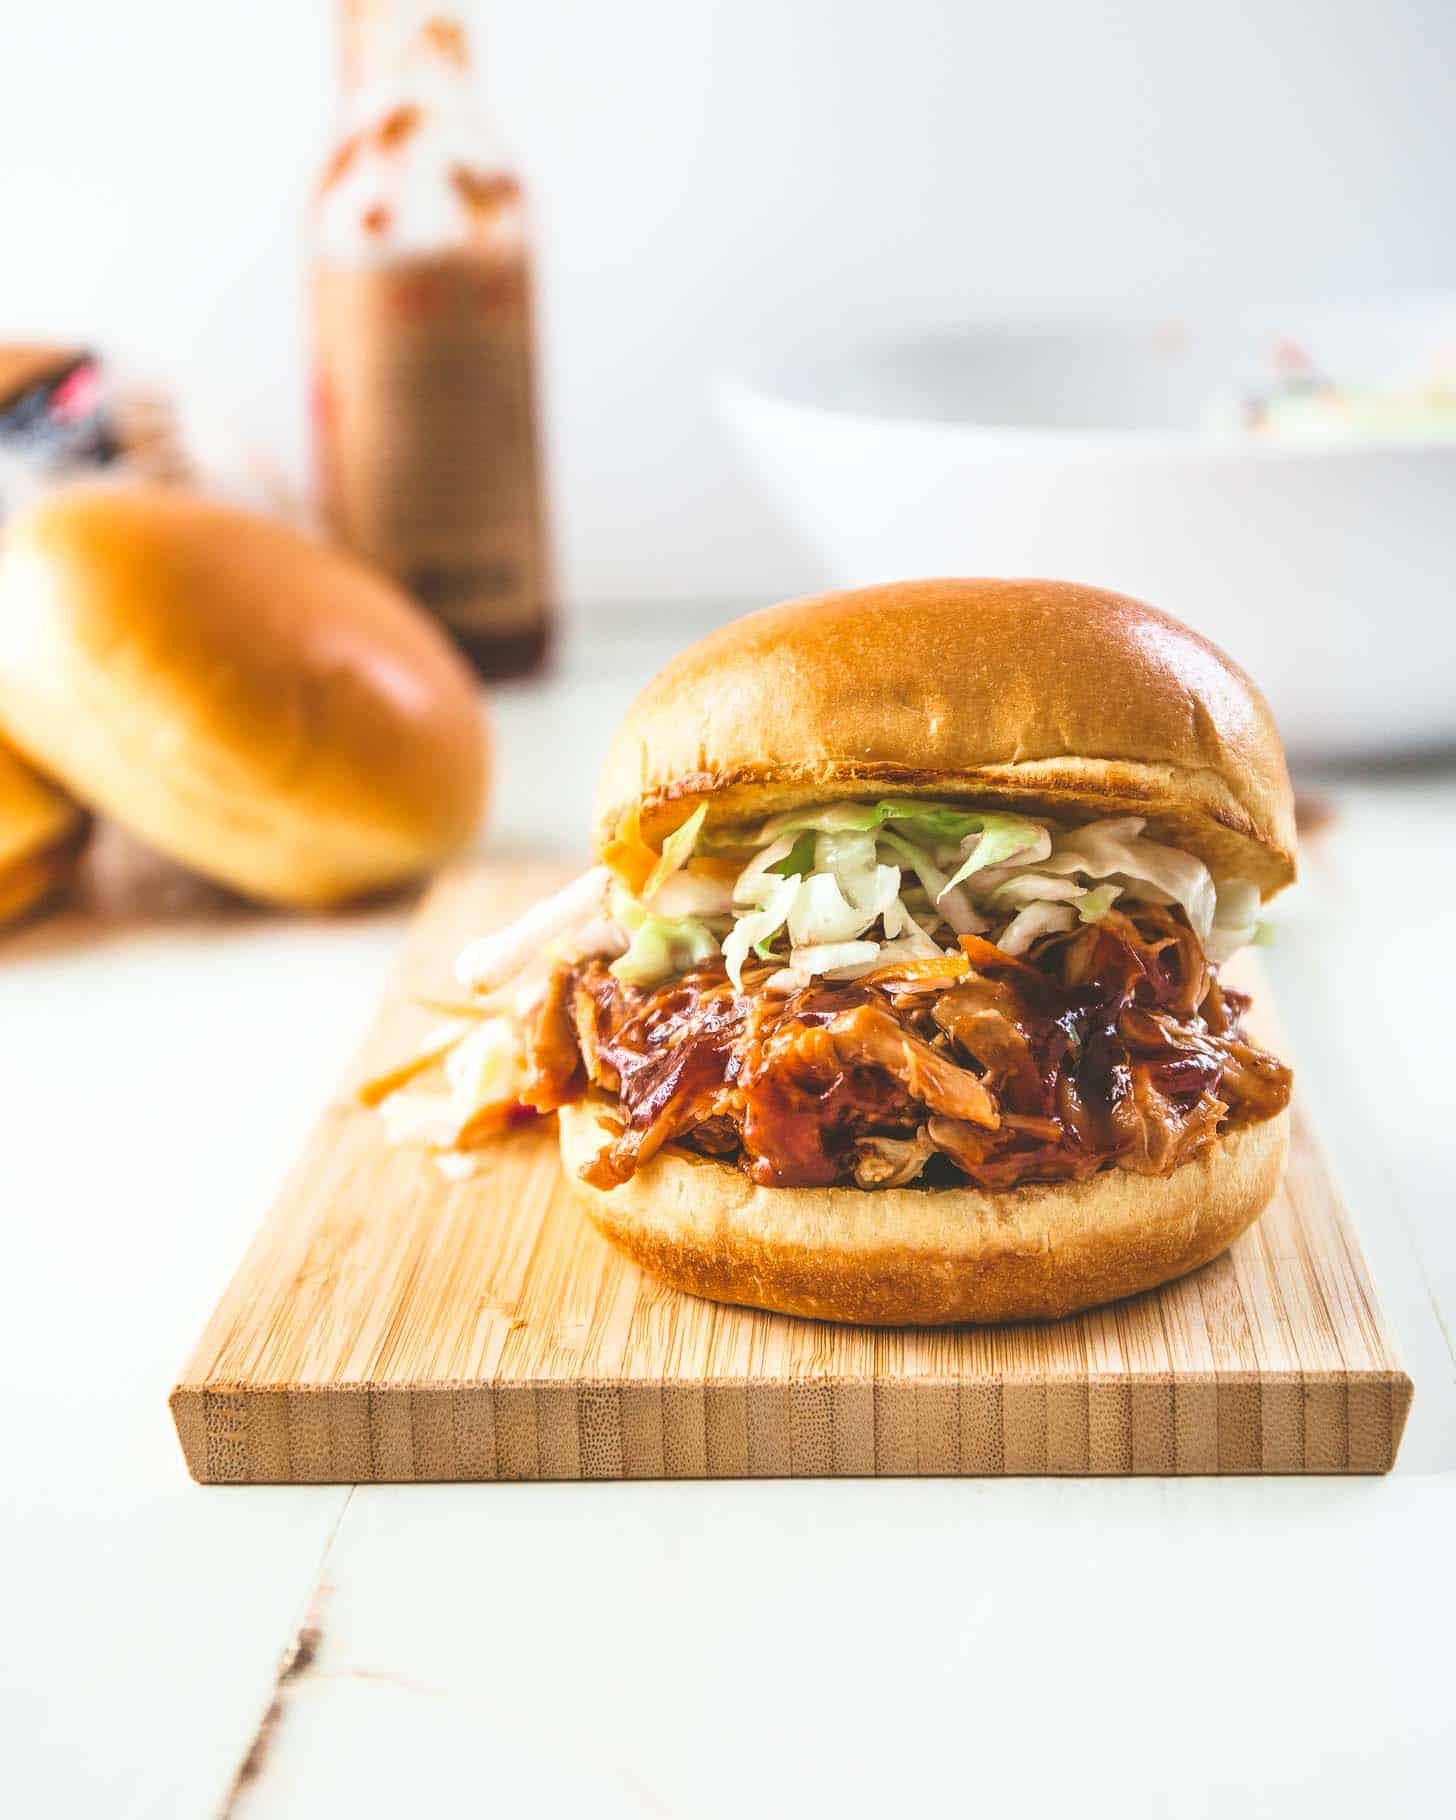 BBQ Pulled Chicken sandwich on a wood cutting board